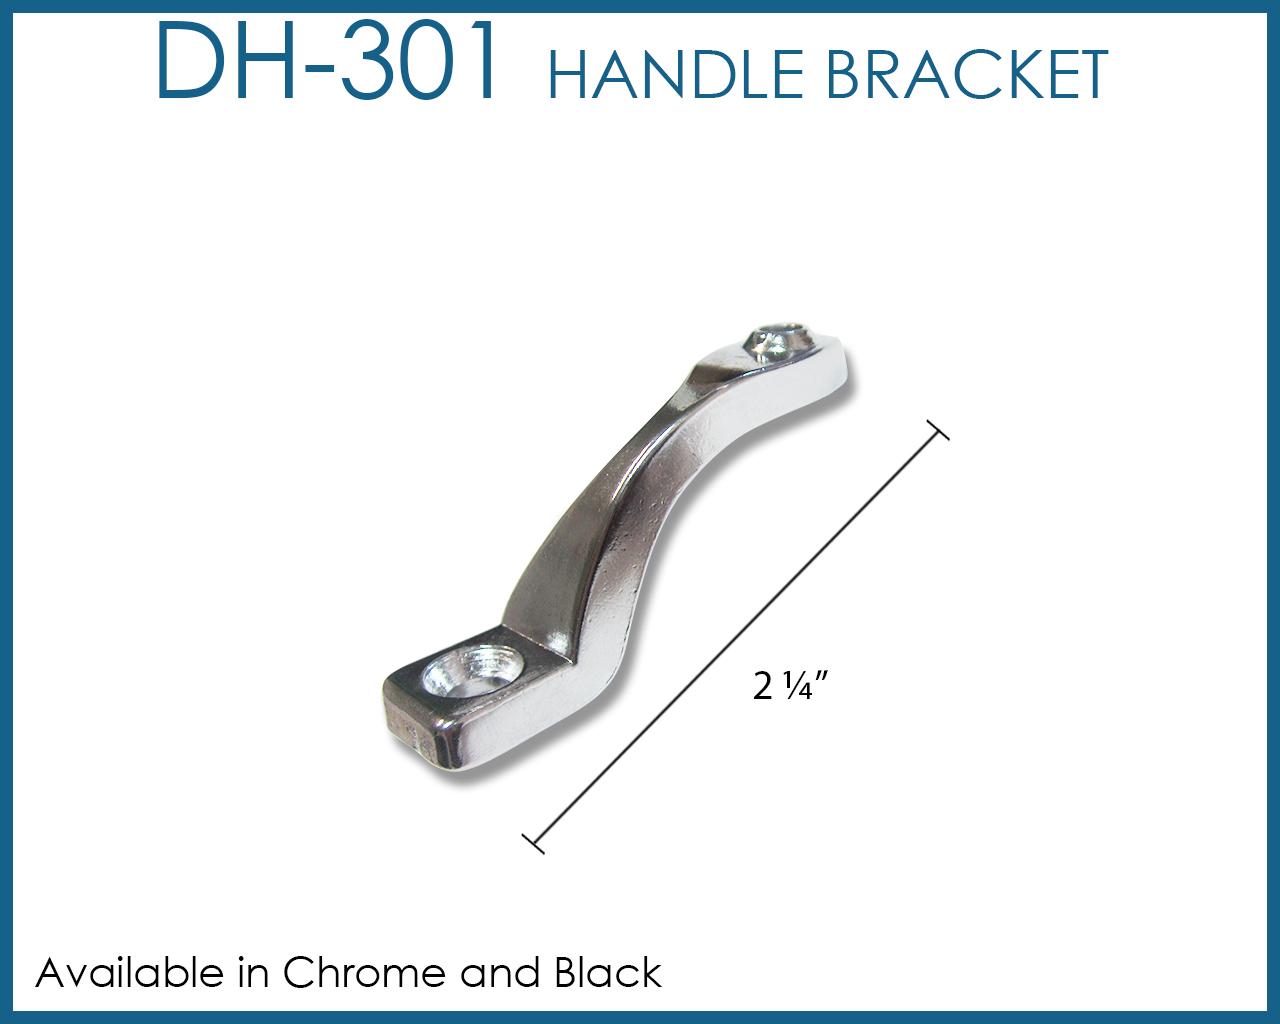 Wood Handle Brackets For Sliding Glass Doors Image